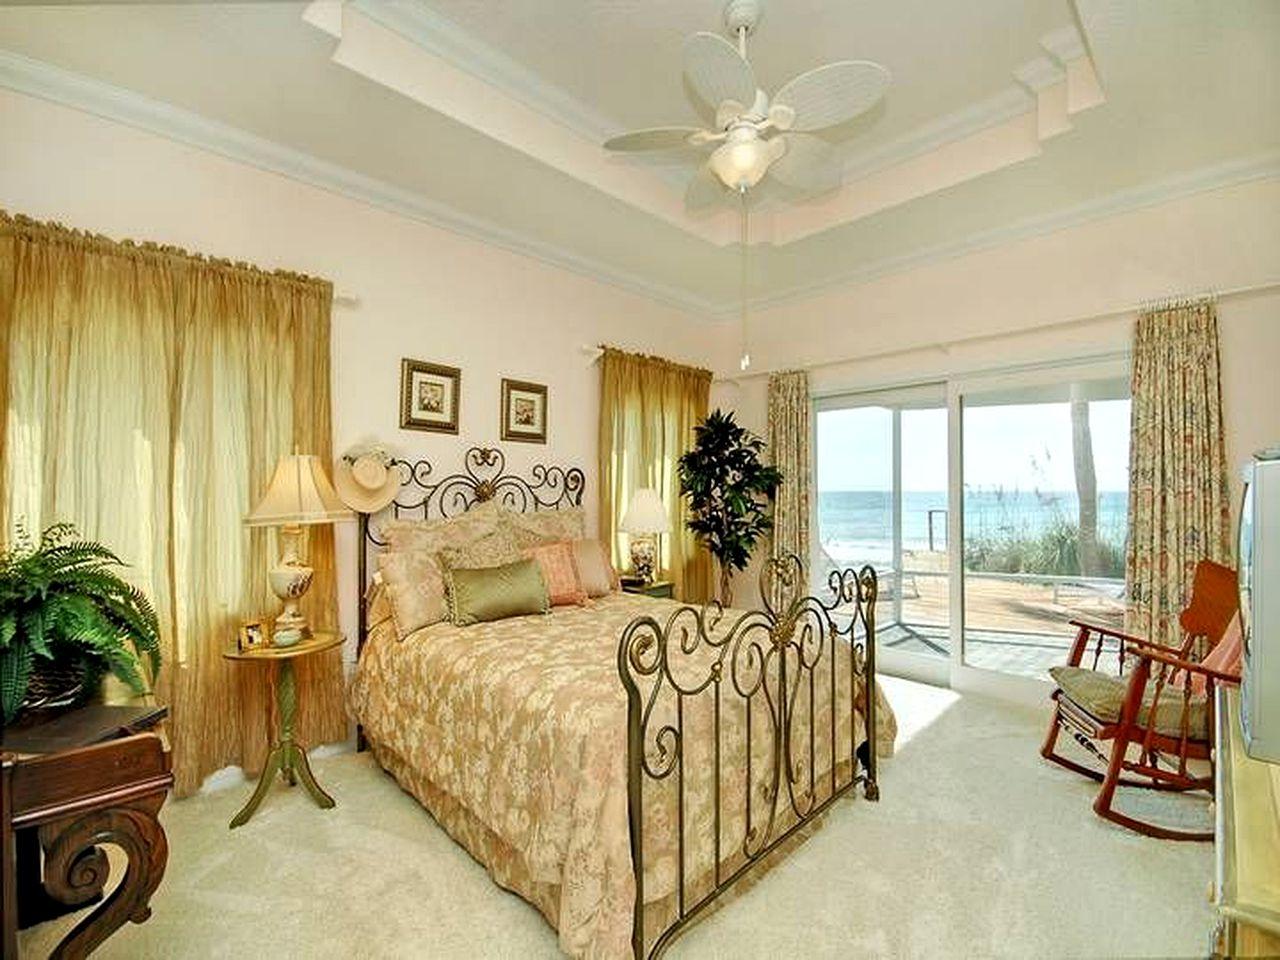 Beachfront Villa in the Florida Keys